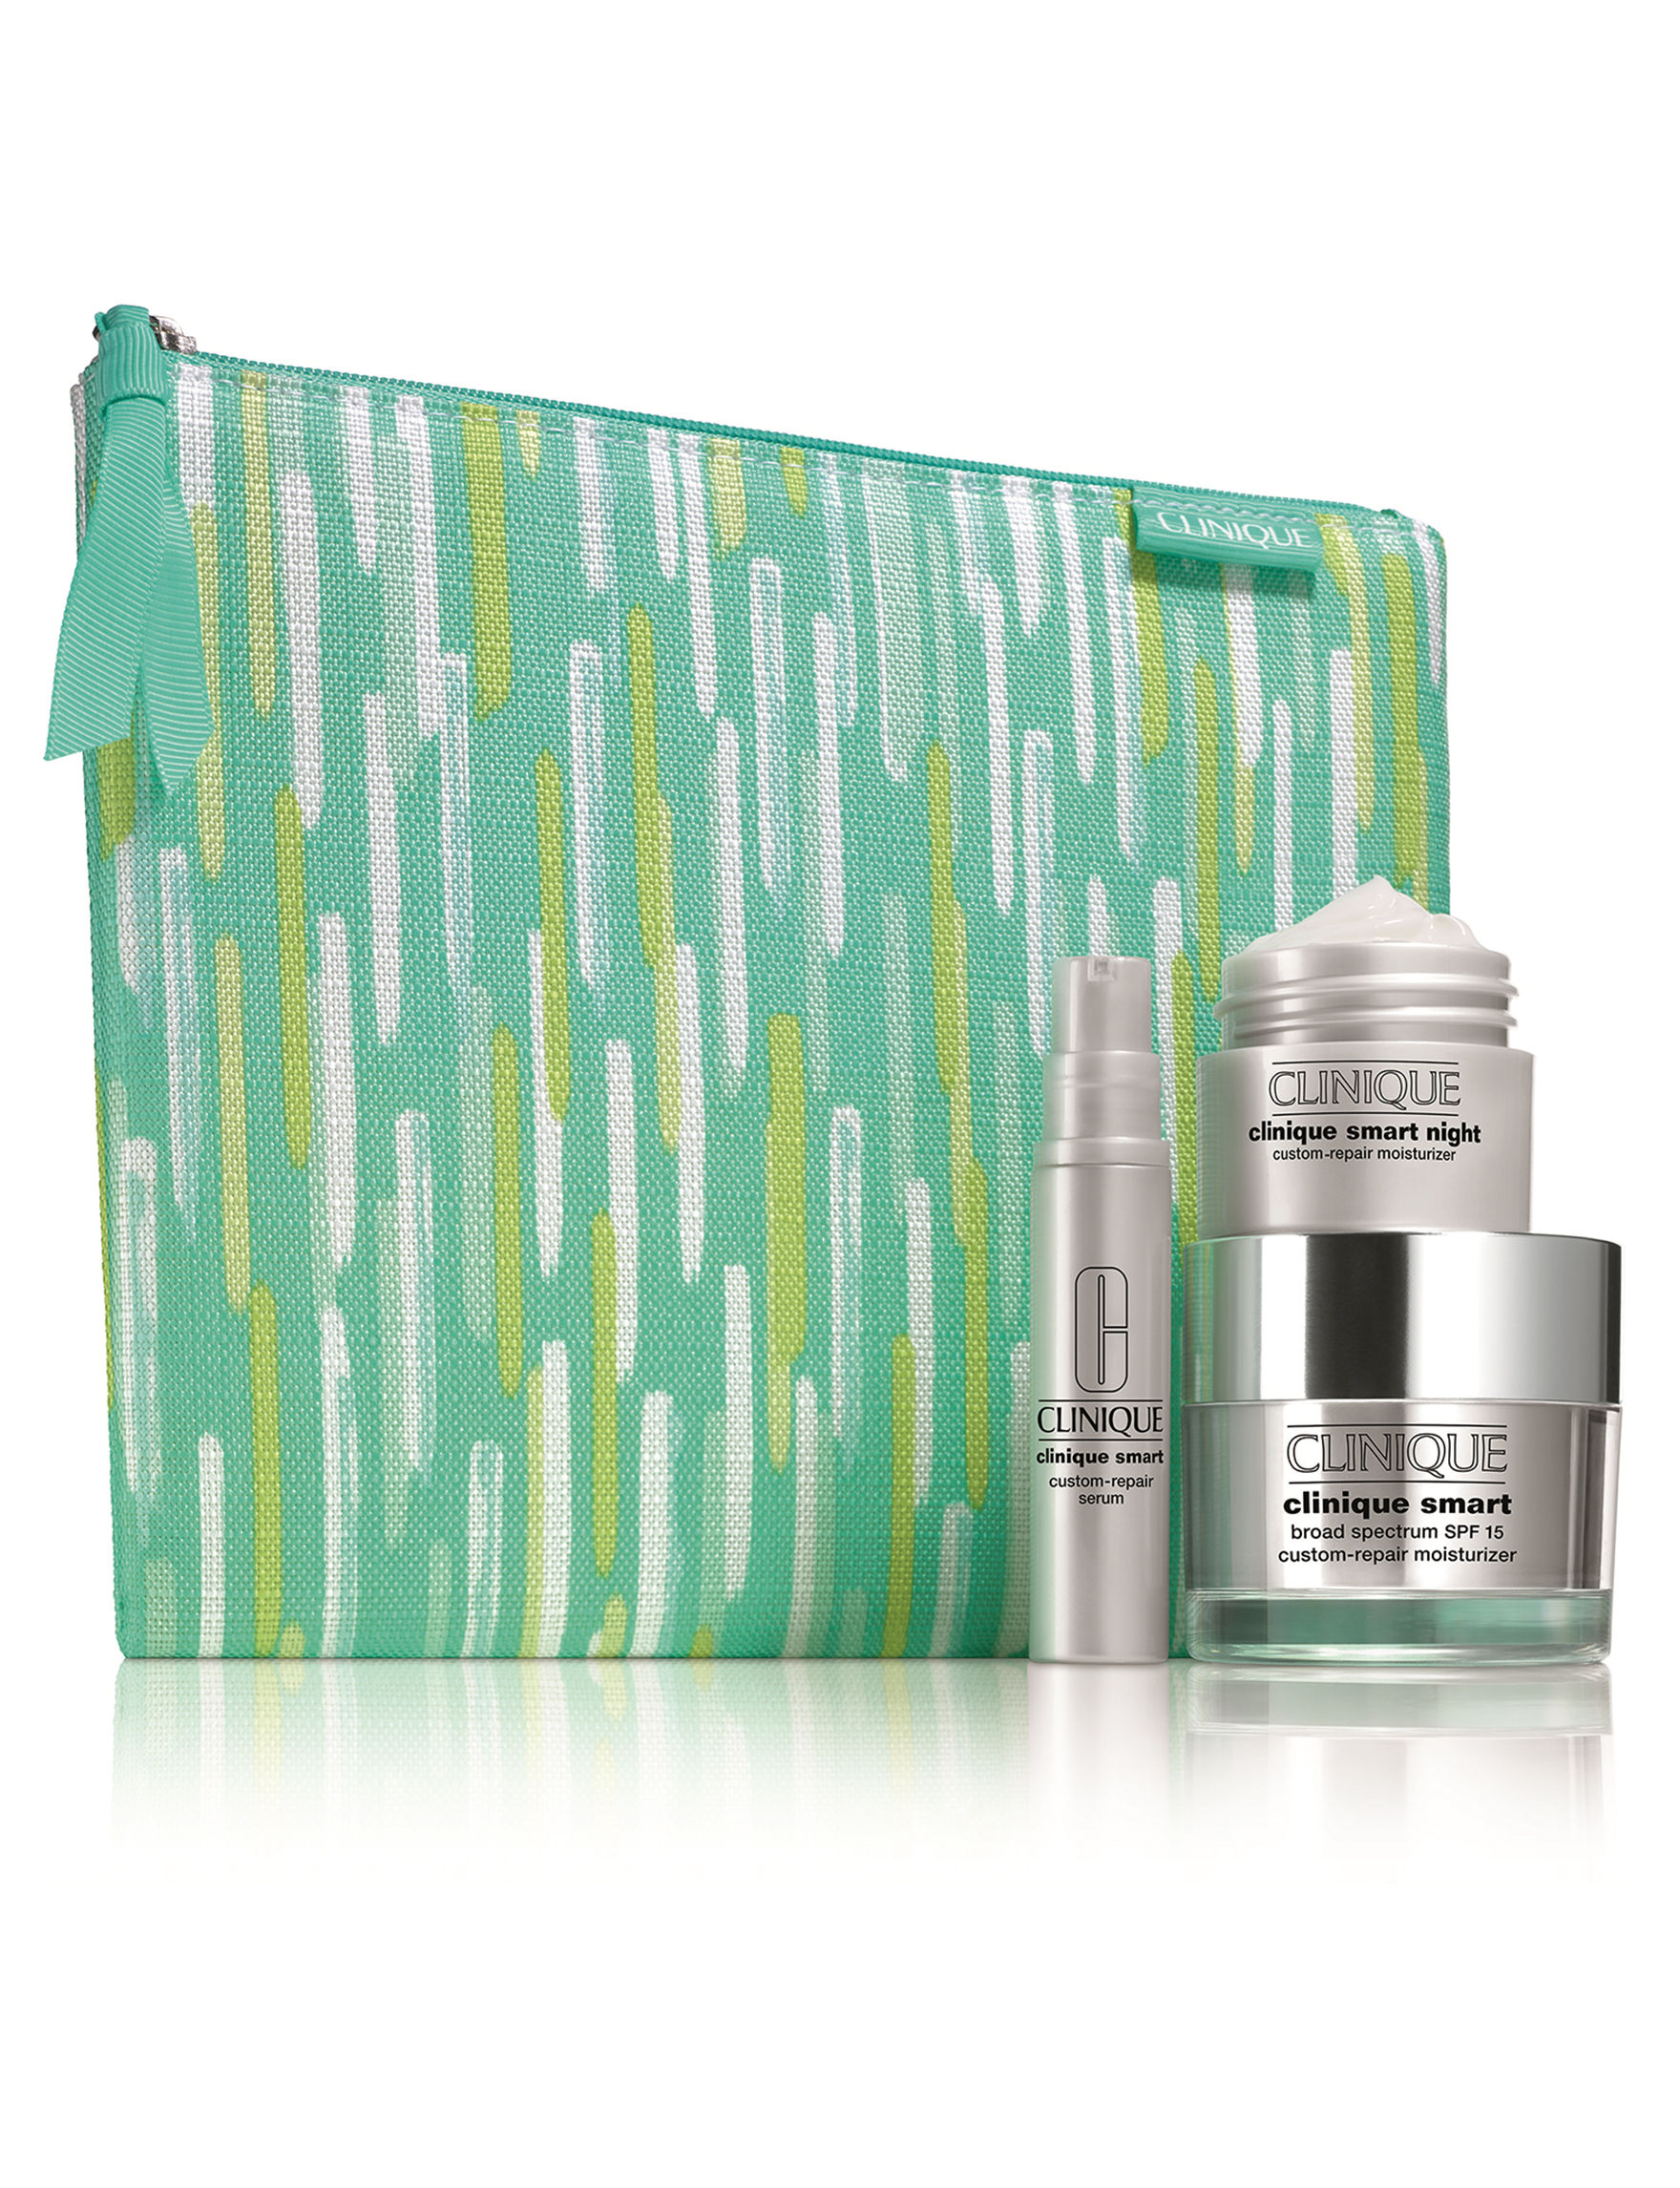 Clinique  Moisturizers Serums & Treatments Skin Care Kits & Sets